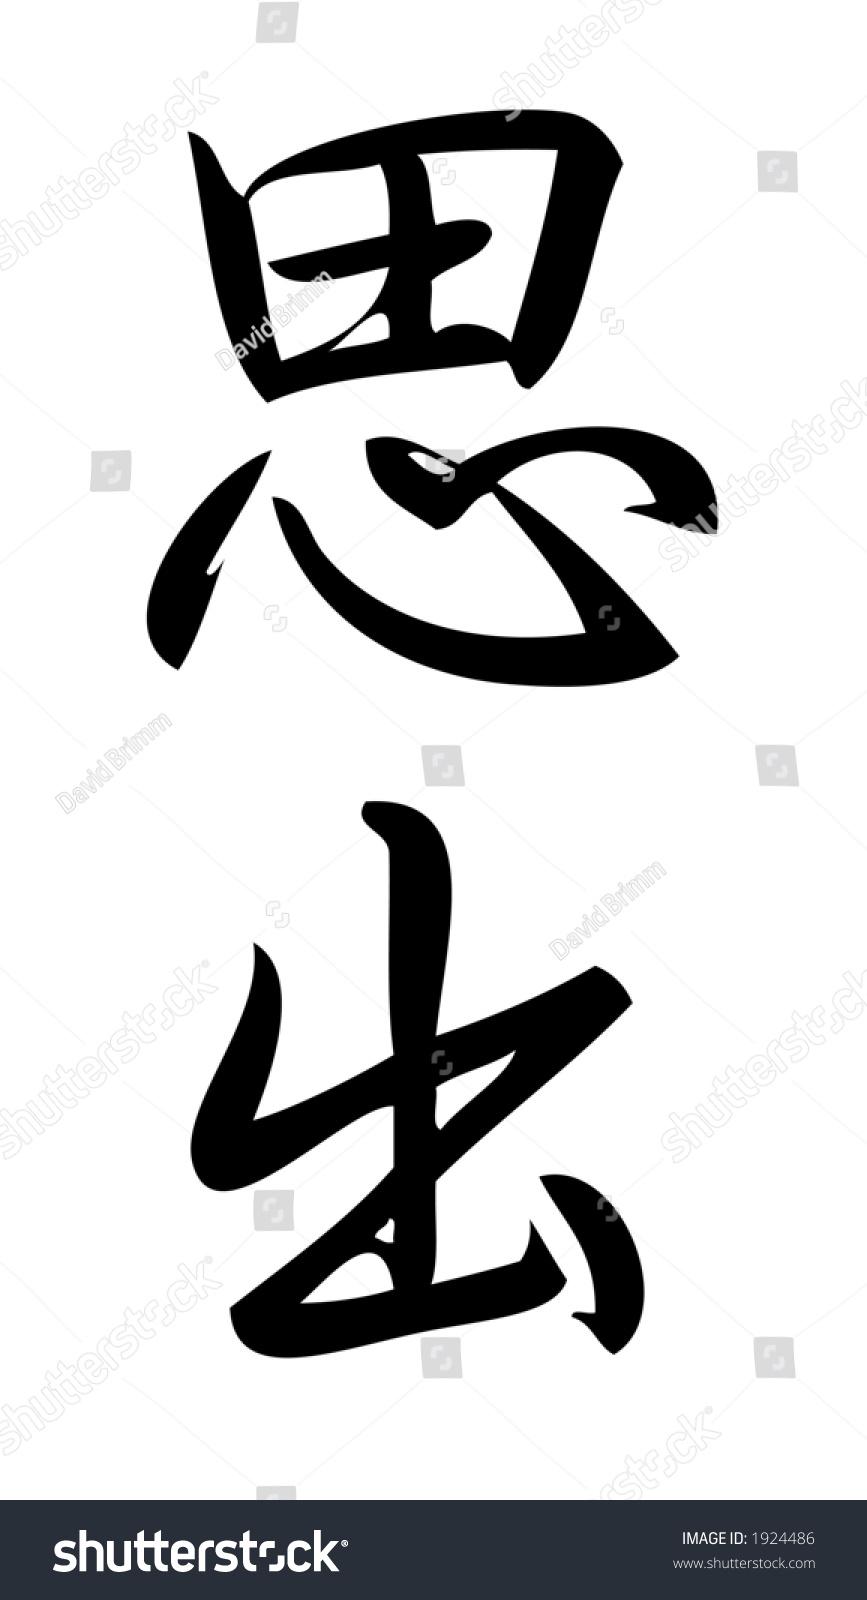 Kanji character memory remembrance remember kanji stock kanji character for memory remembrance remember kanji are chinese characters first biocorpaavc Choice Image